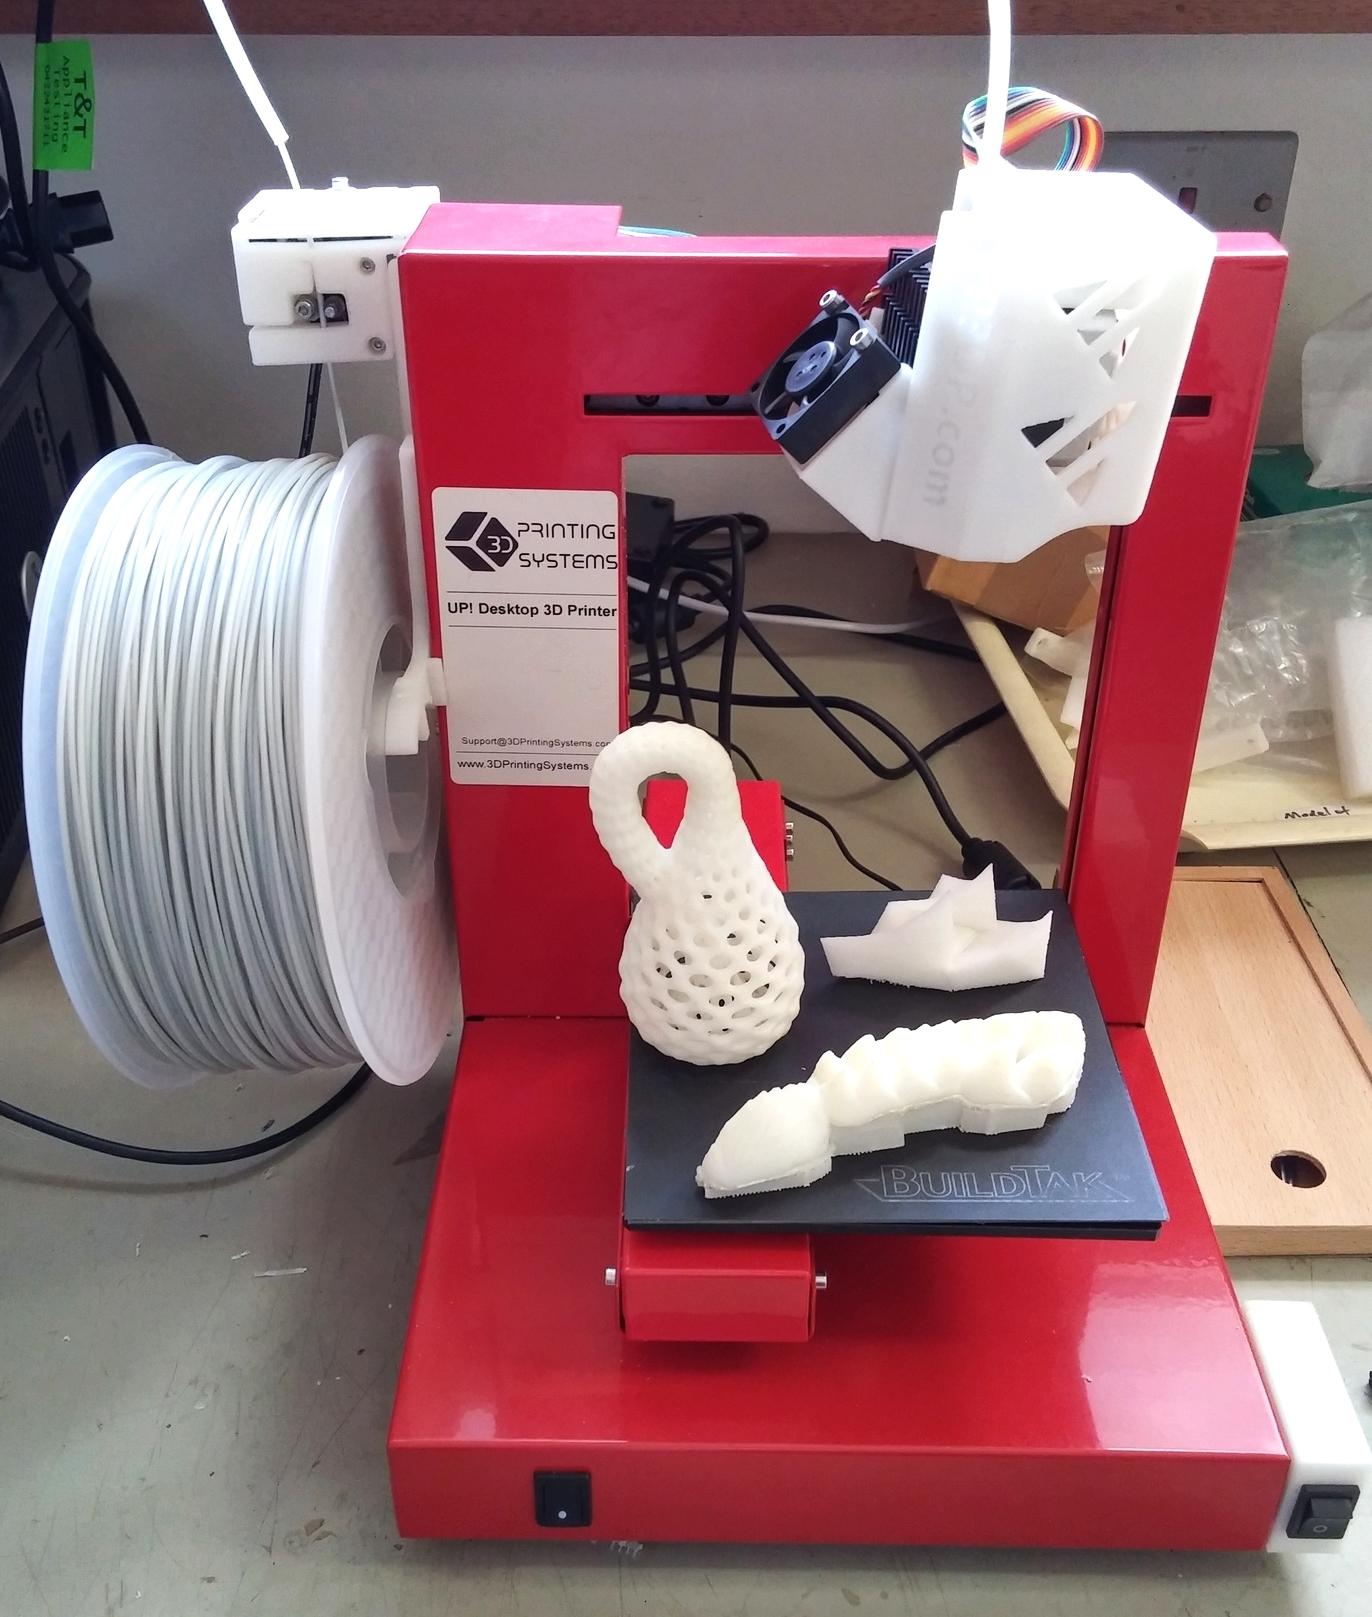 UP! Desktop 3D Printer